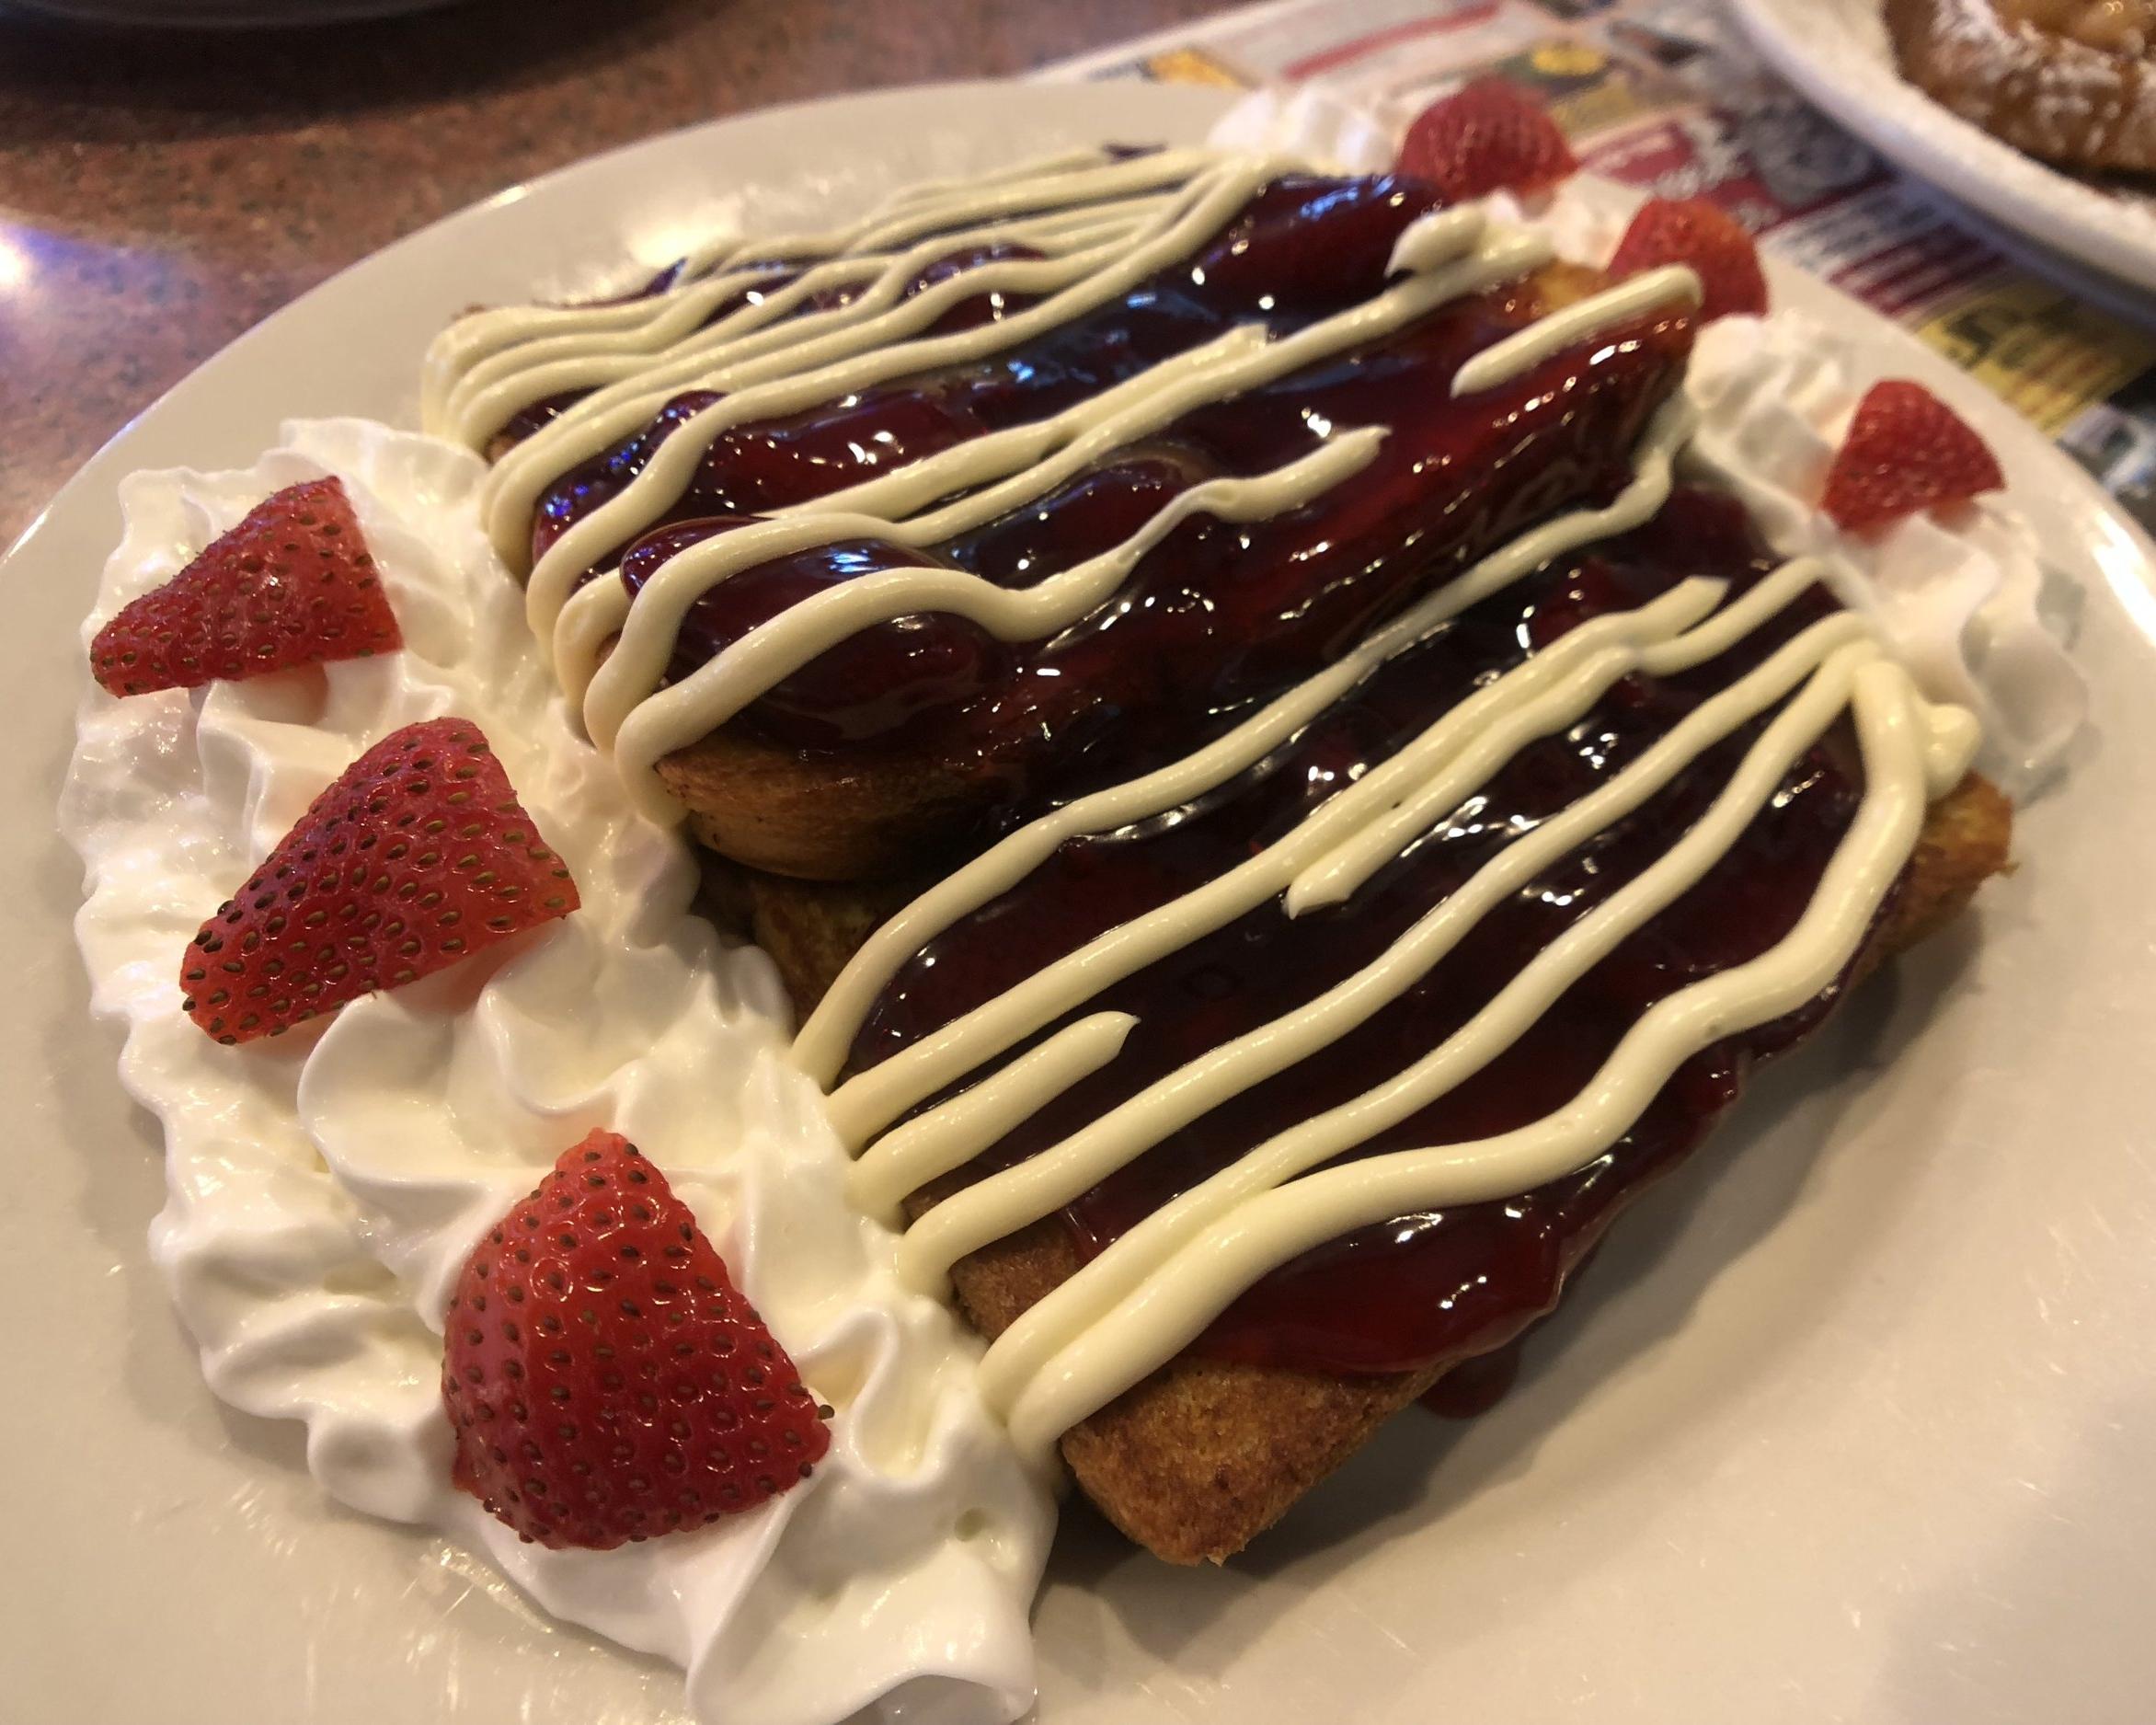 Stuffed Strawberry Cheesecake French Toast